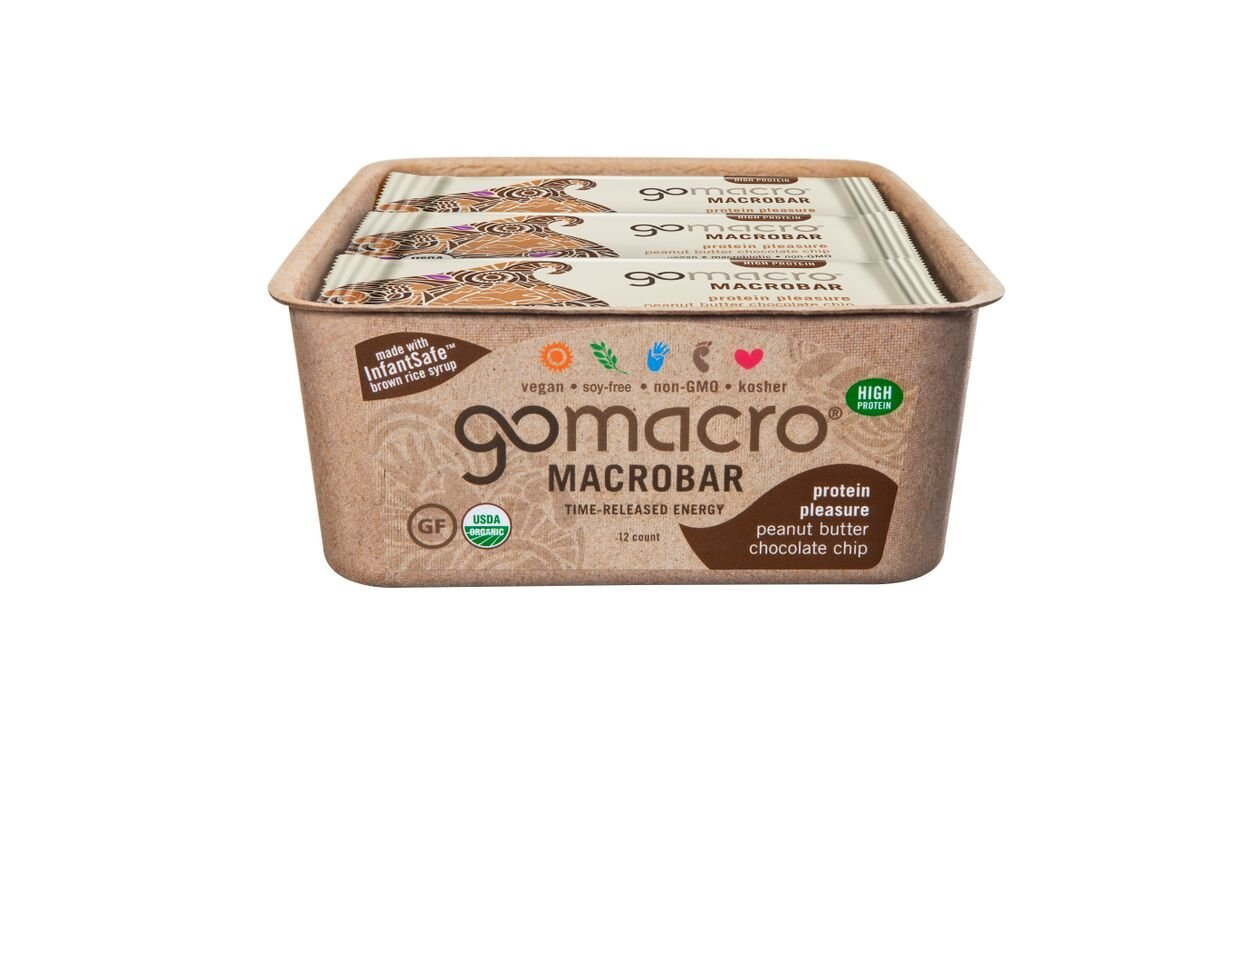 GoMacro MacroBar, Organic Vegan Protein Bar, Peanut Butter + Chocolate Chip, 2.4 oz (Pack of 12)